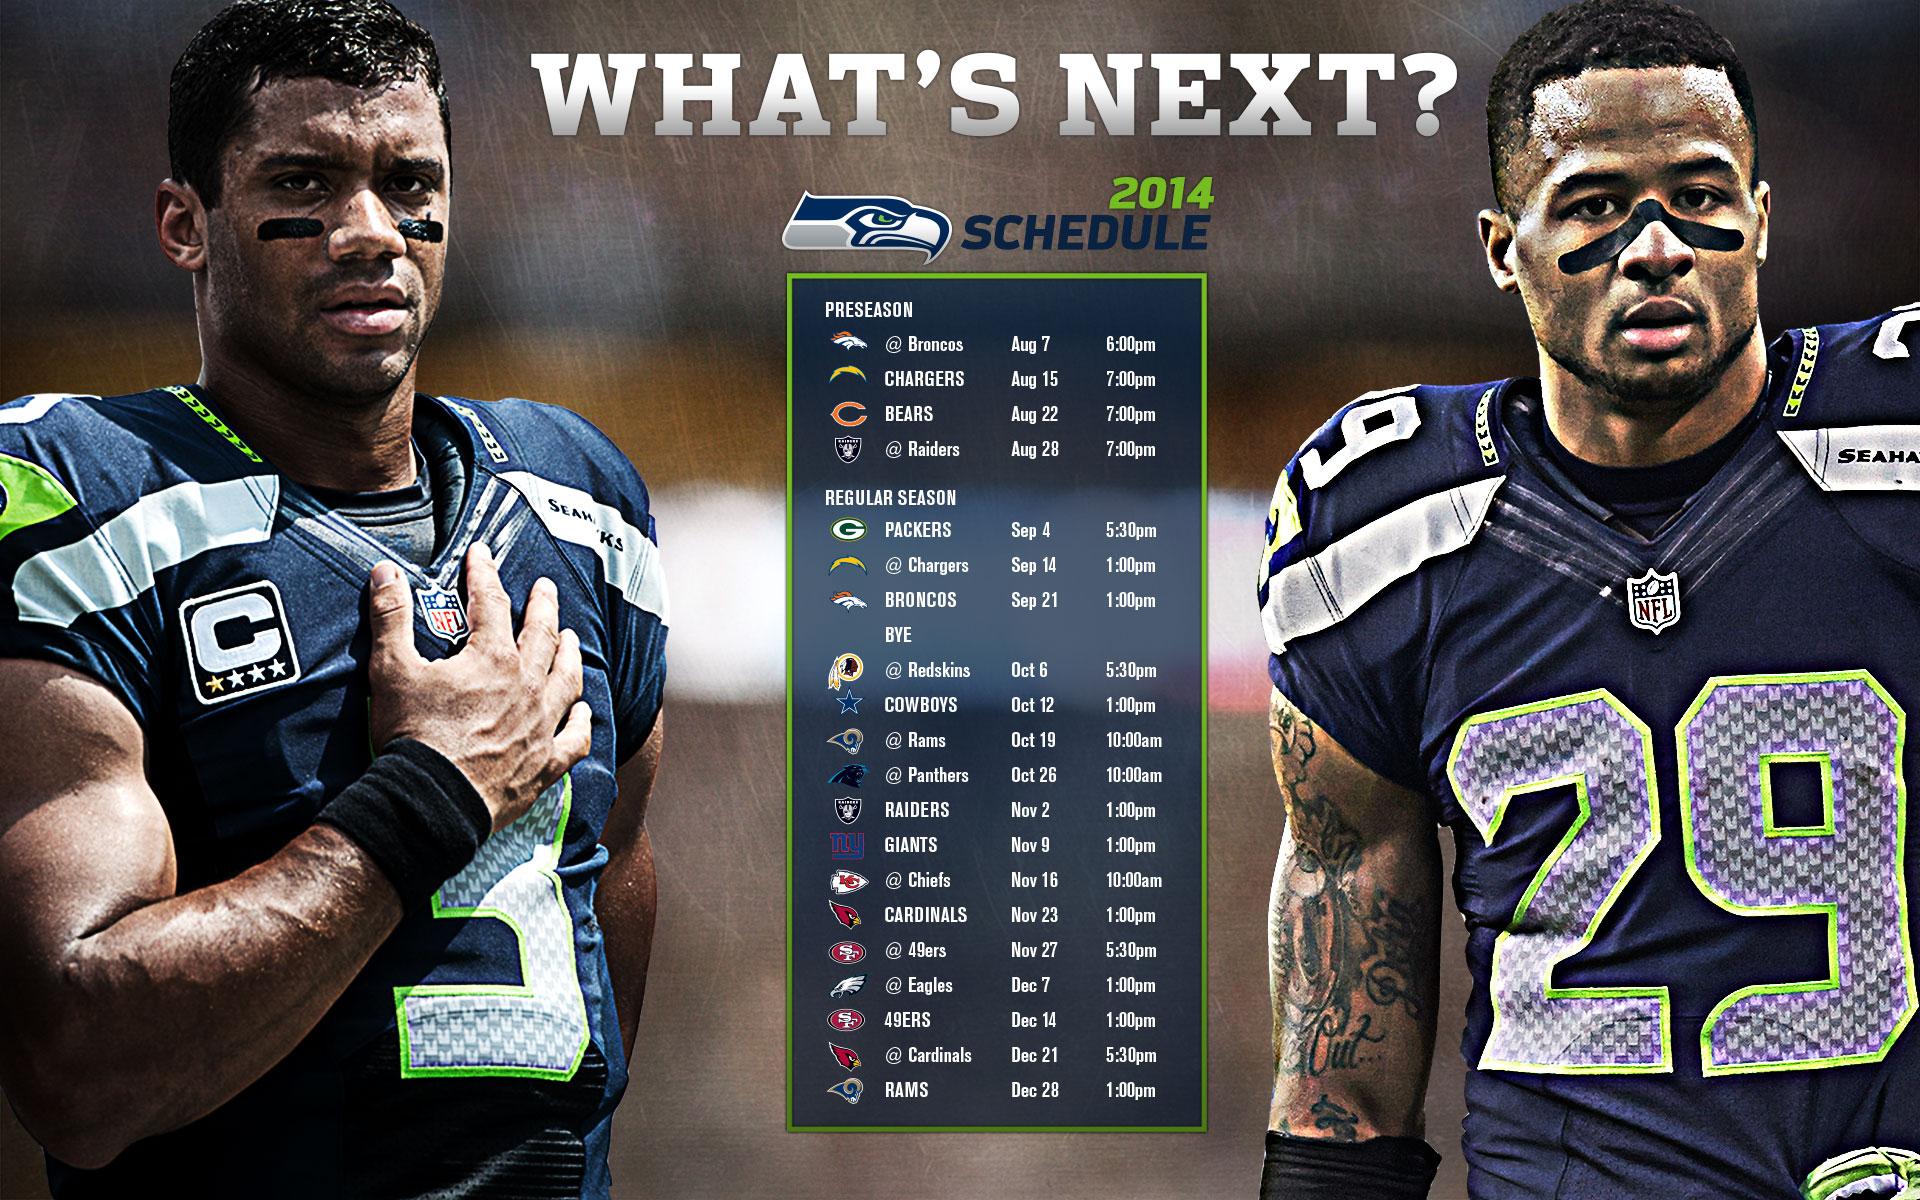 2015 Seattle Seahawks Schedule HD Photo Galeries Best WallPaper 1920x1200